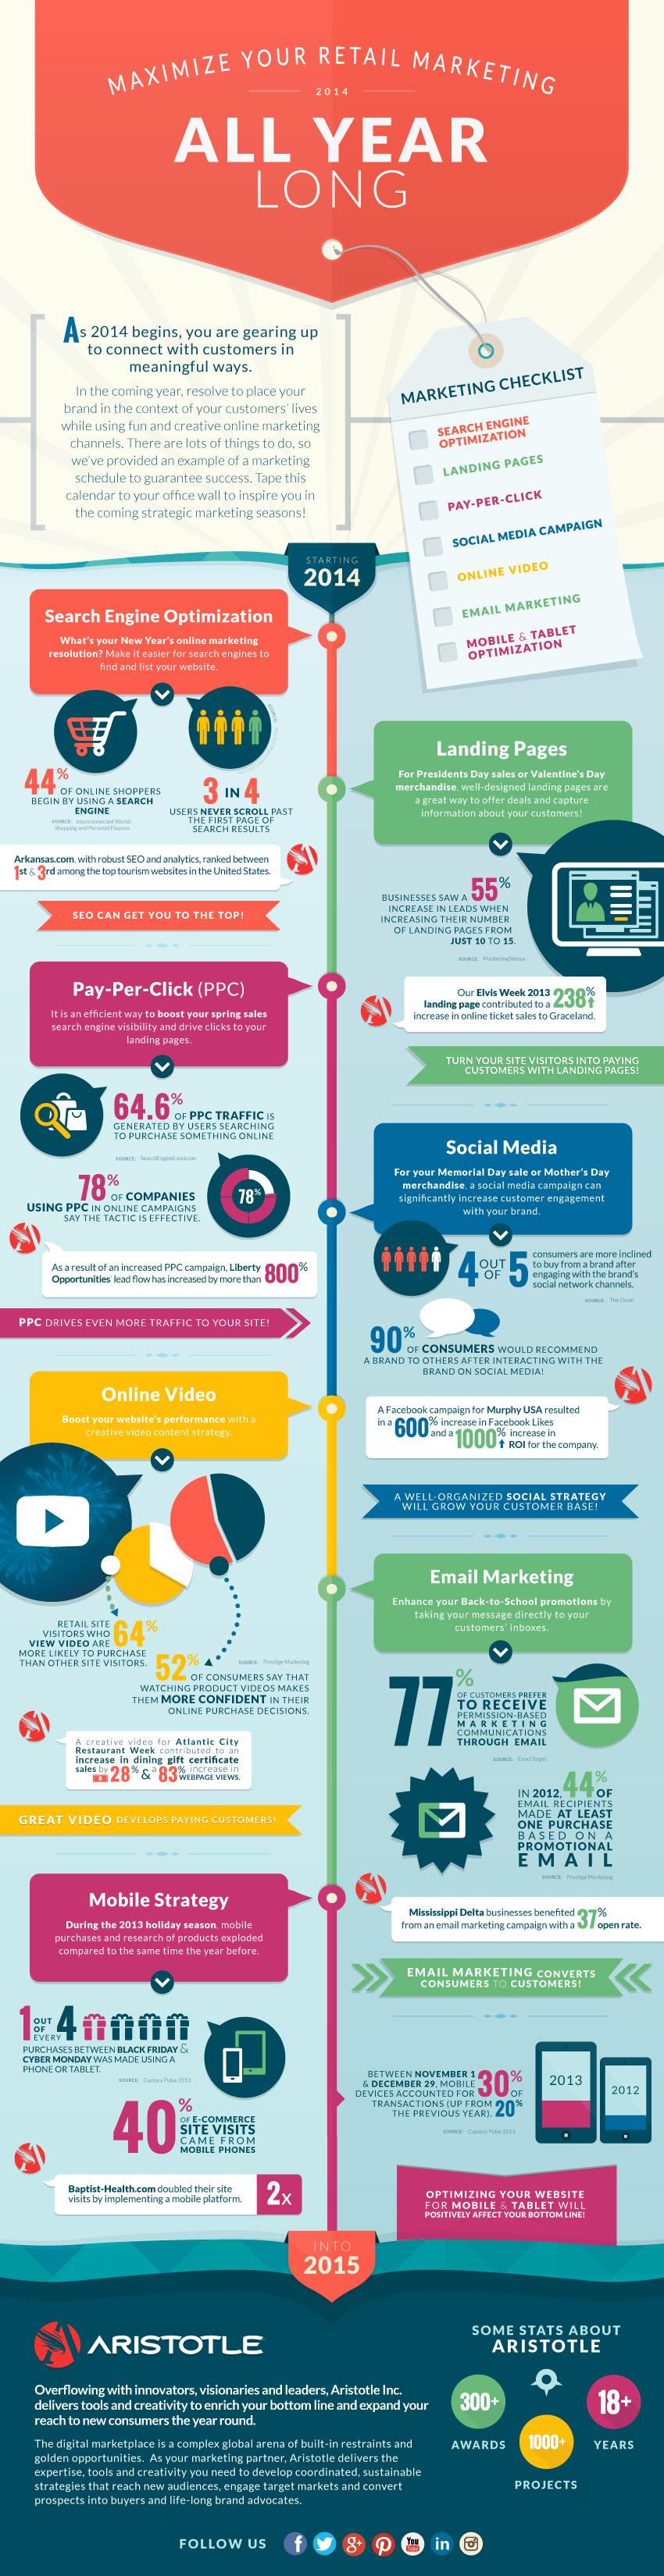 aristotle-online-retails-strategies-infographic